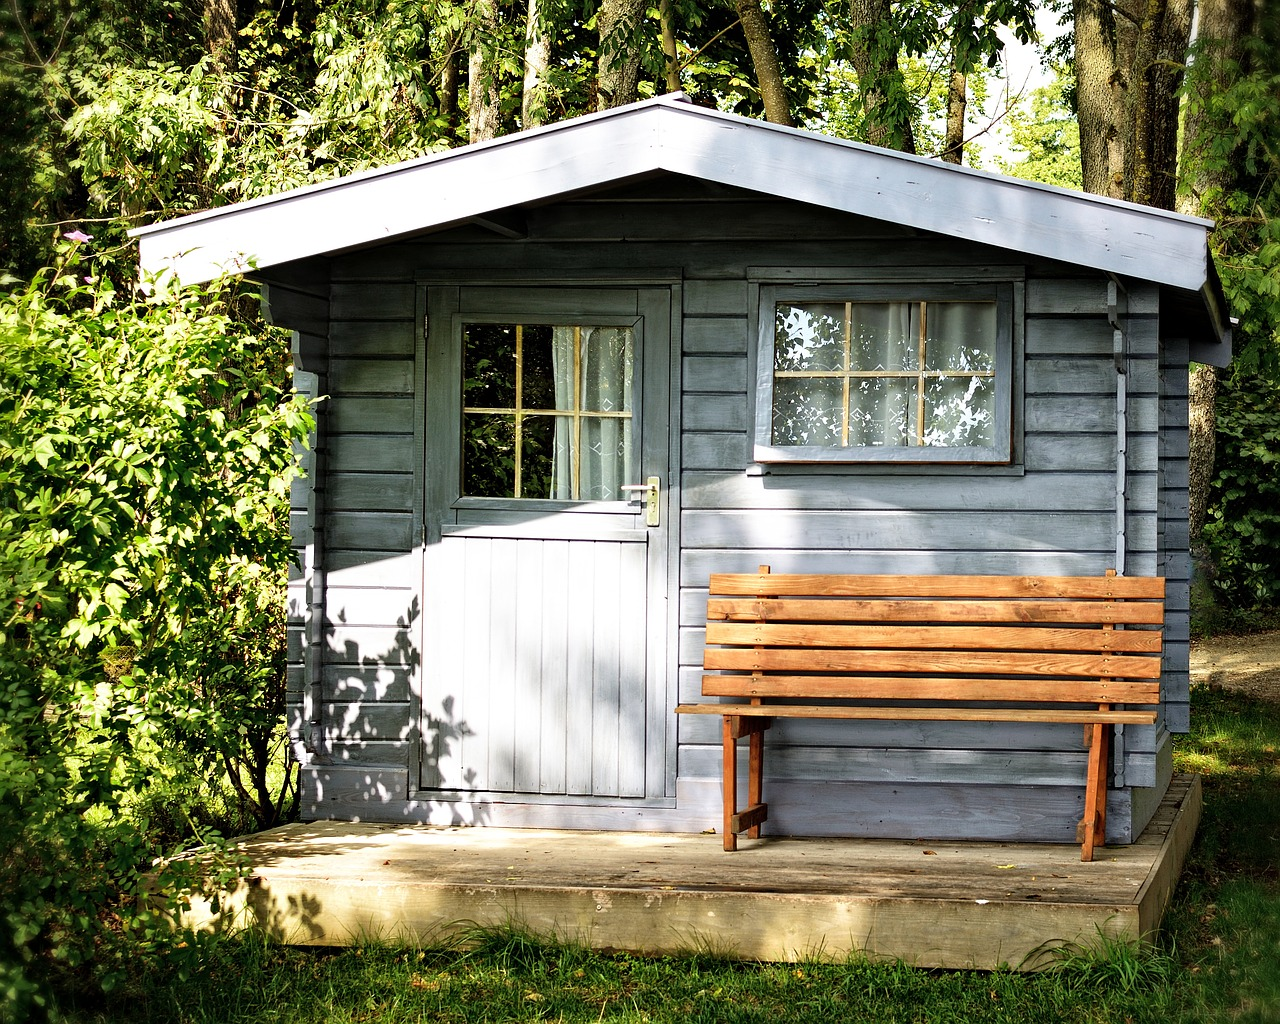 comment choisir son abri de jardin blog distripool. Black Bedroom Furniture Sets. Home Design Ideas